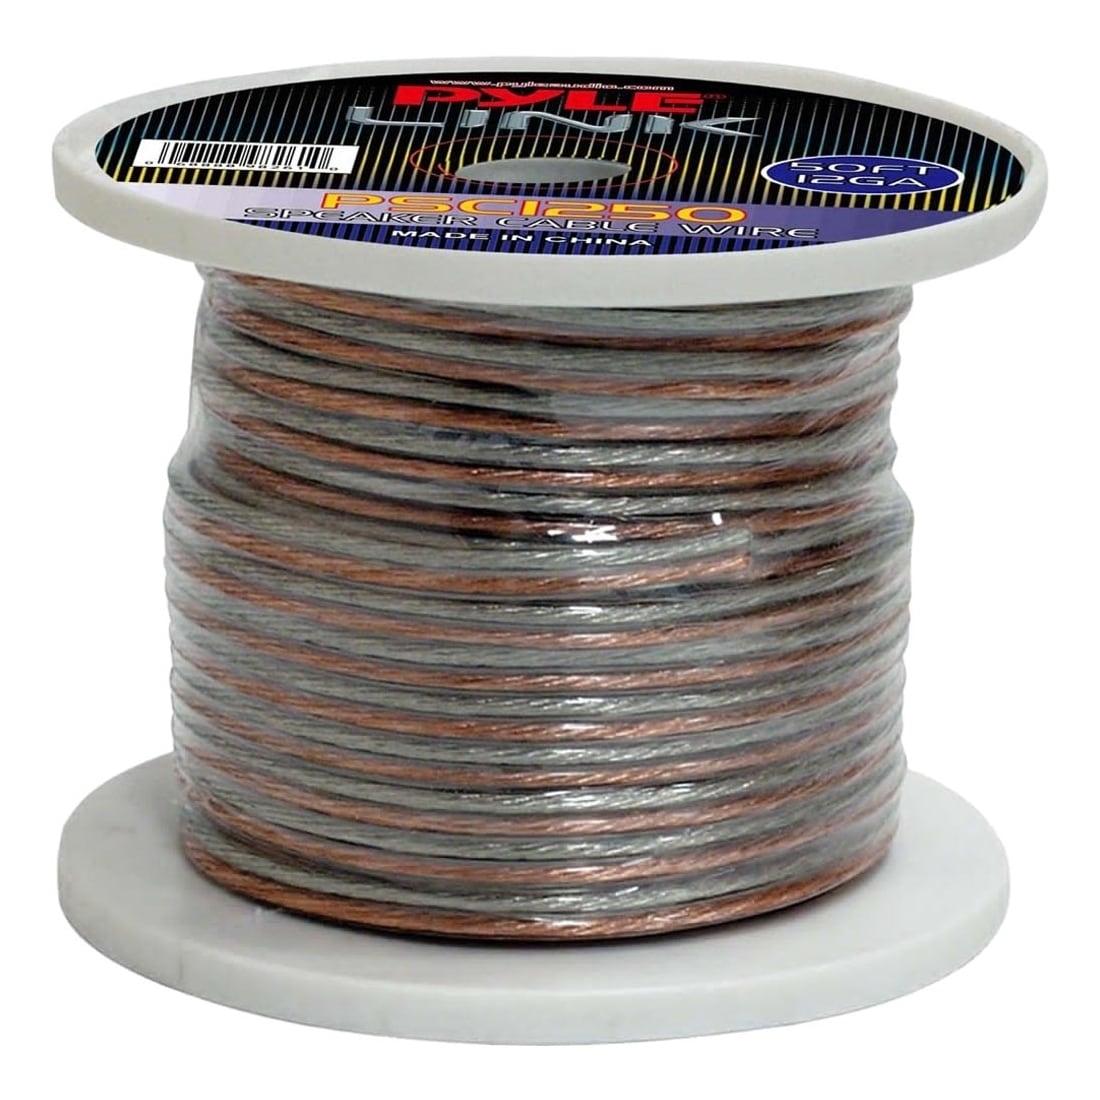 Pyle PSC1250 Audio Cable